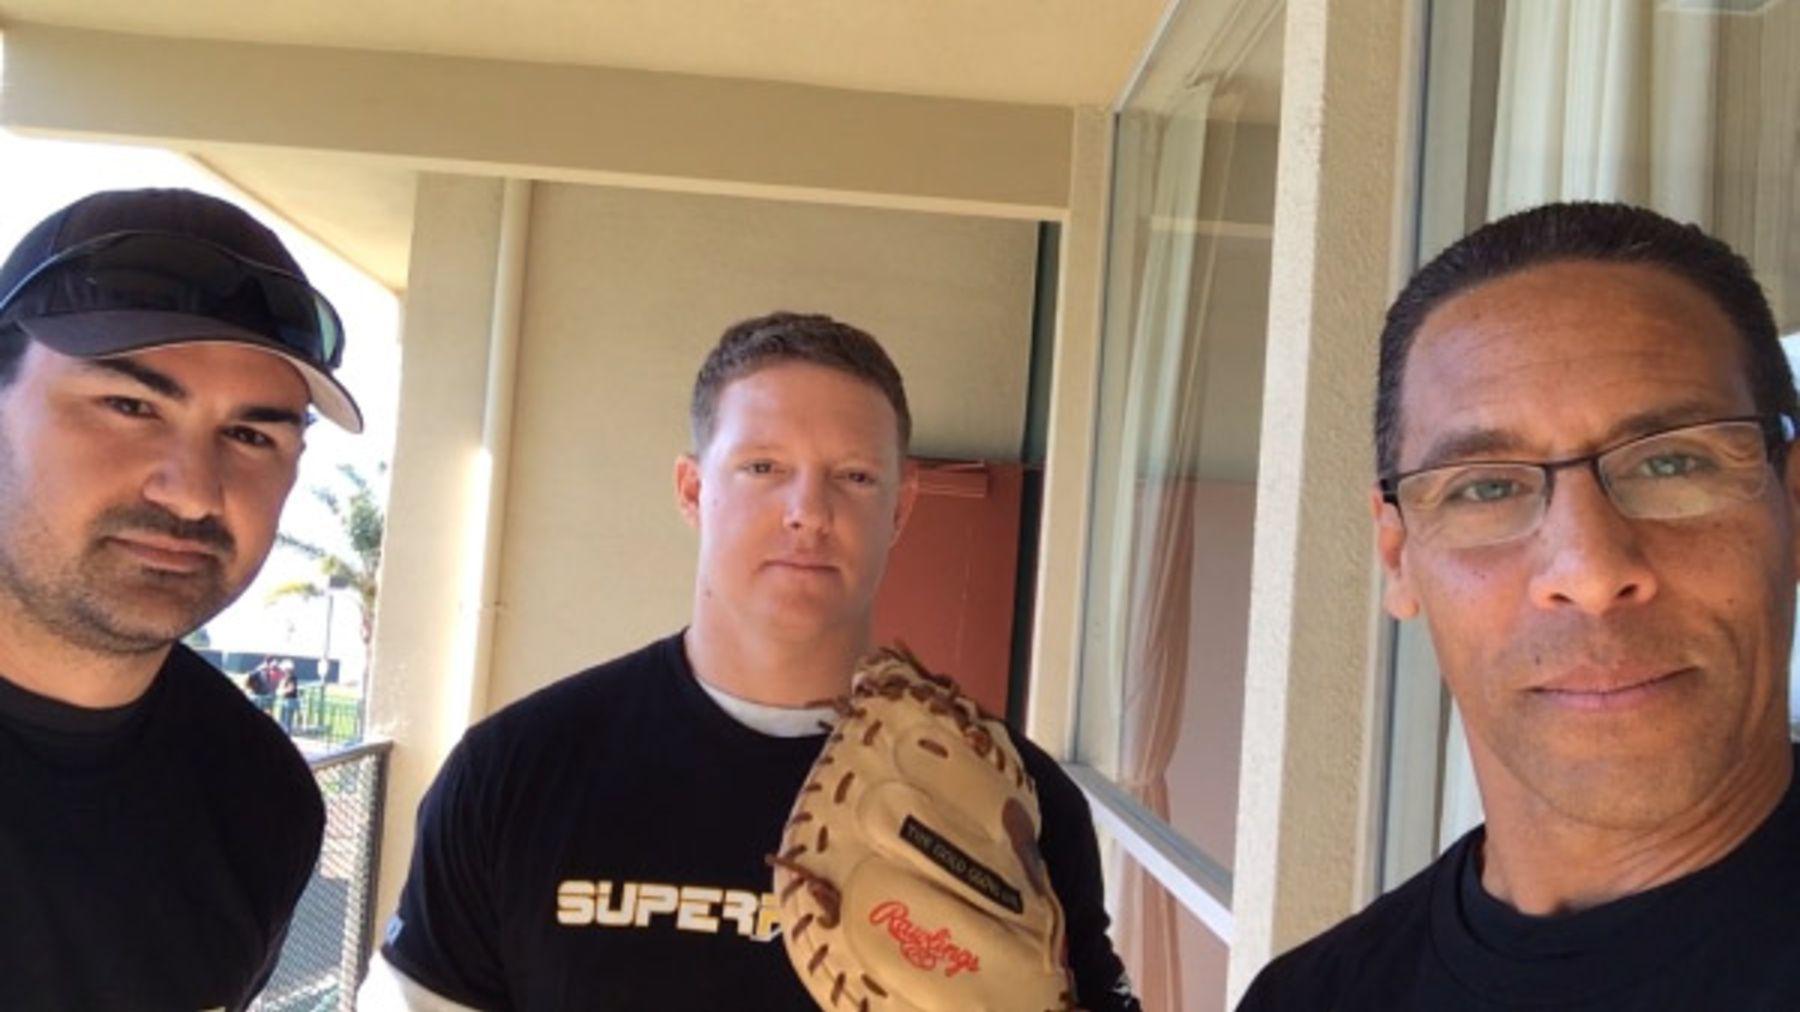 Adrian Gonzalez and Nick Hundley - Catcher's Mitt - Miles a Minute